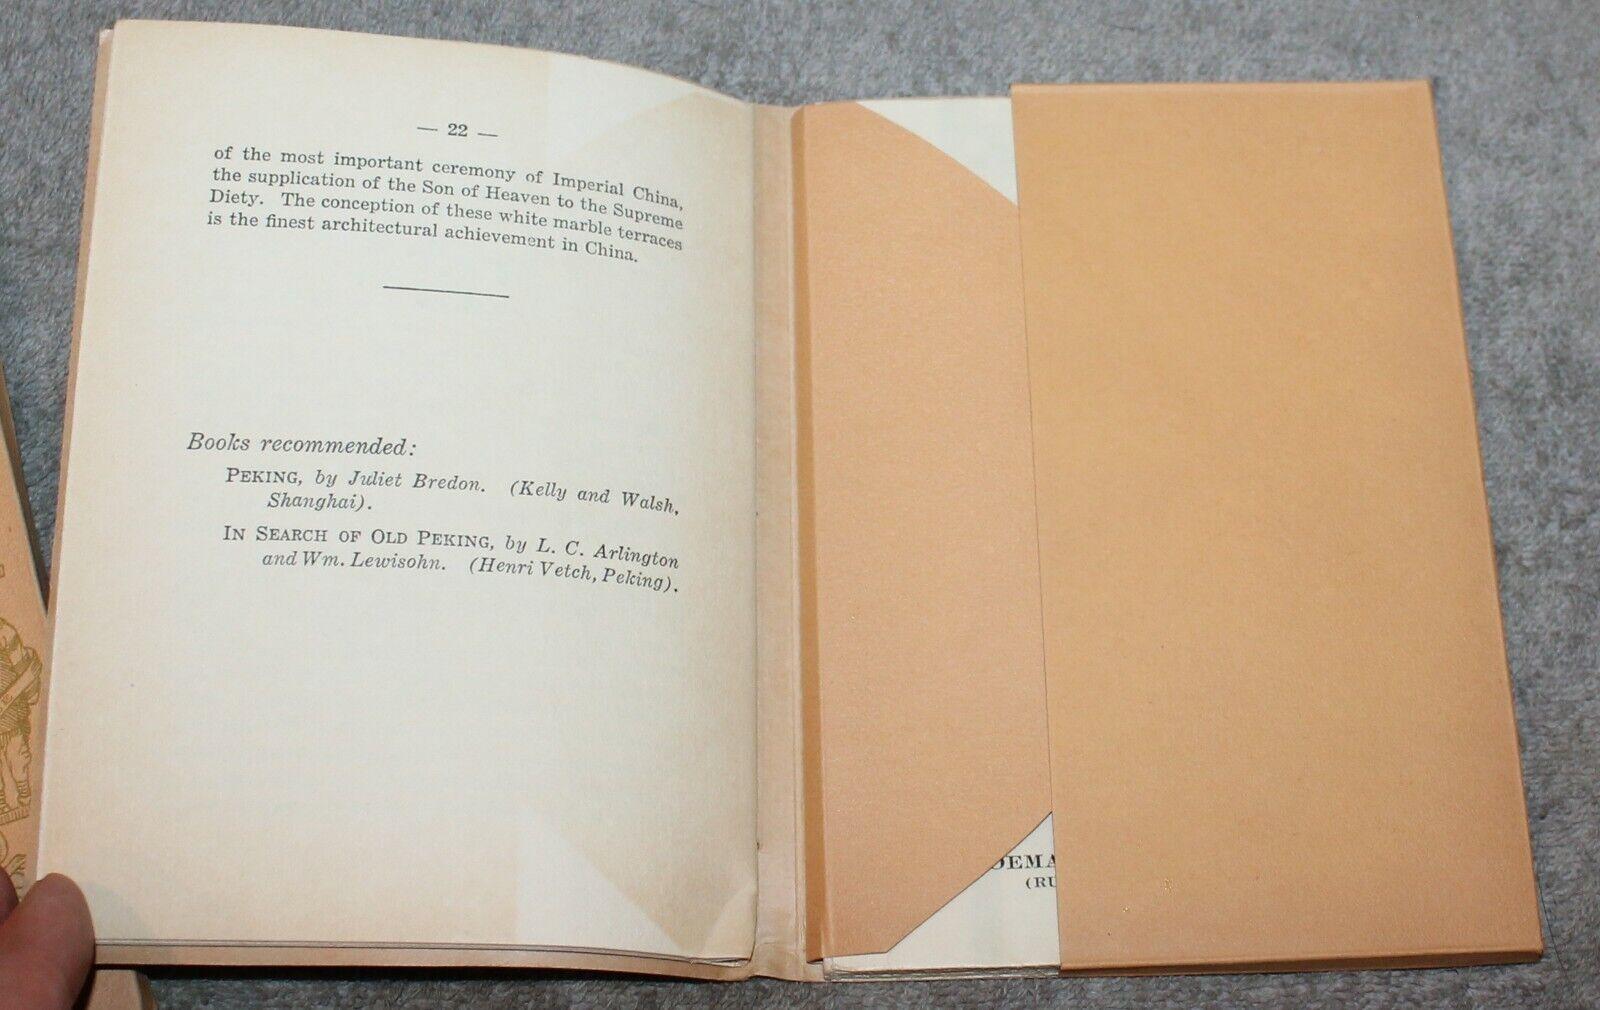 RARE 1936 MAP AND HISTORY OF PEIPING PEKING CHINA FRANK DORN AMAZING CONDITION